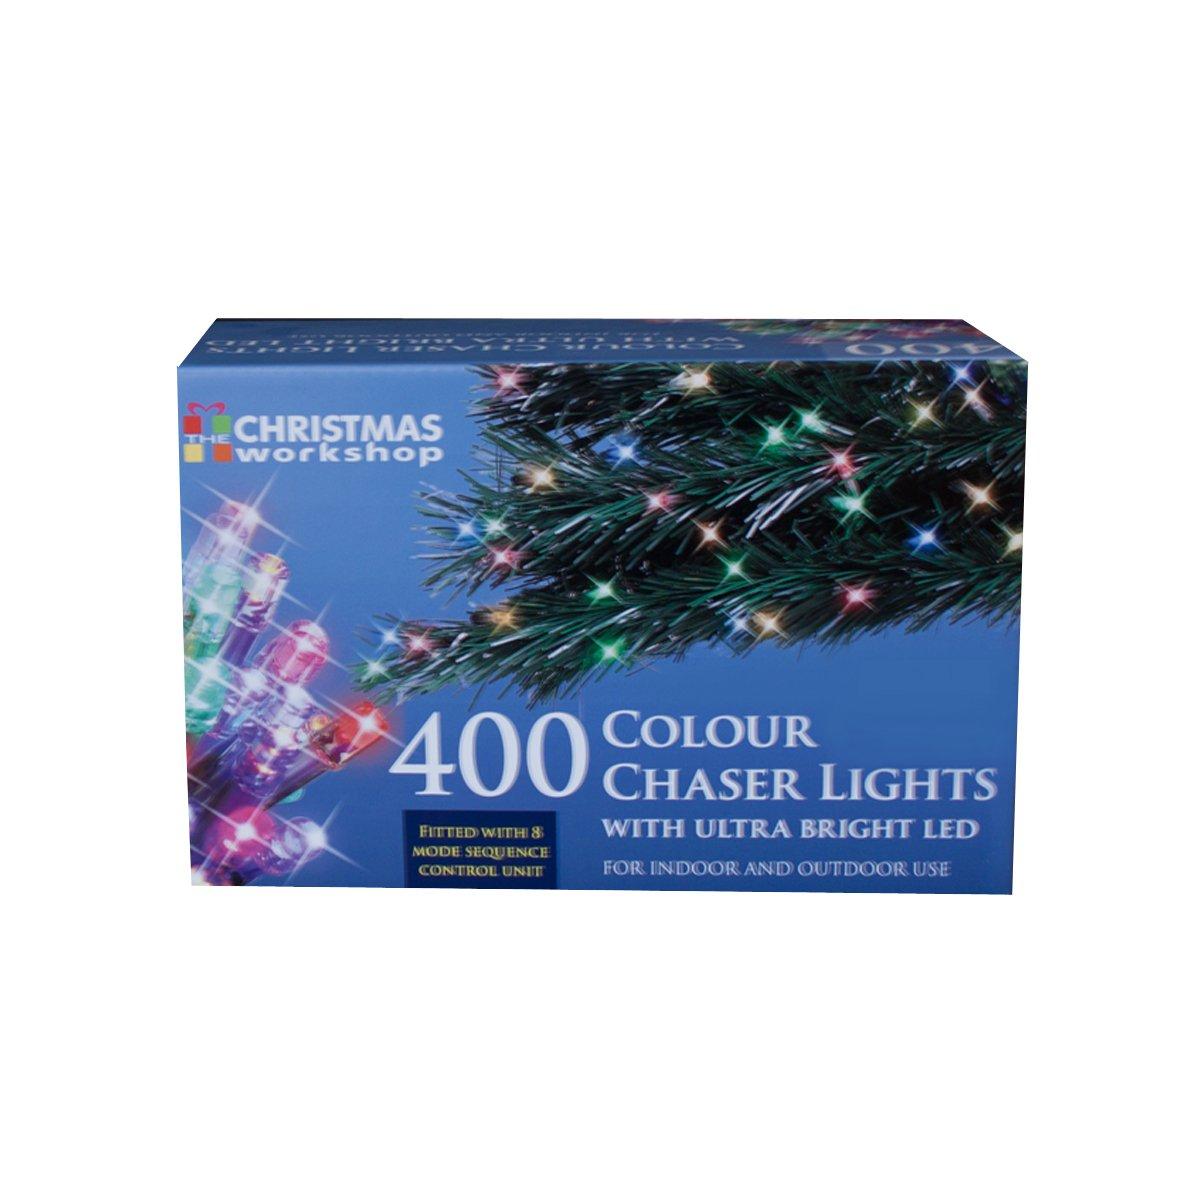 76120 Christmas Workshop Benross 400 LED Chaser String Lights Bright White, Multi Function Flashing Fairy Light, 8 Modes, Indoor & Outdoor - Garden Party Wedding Benross Group